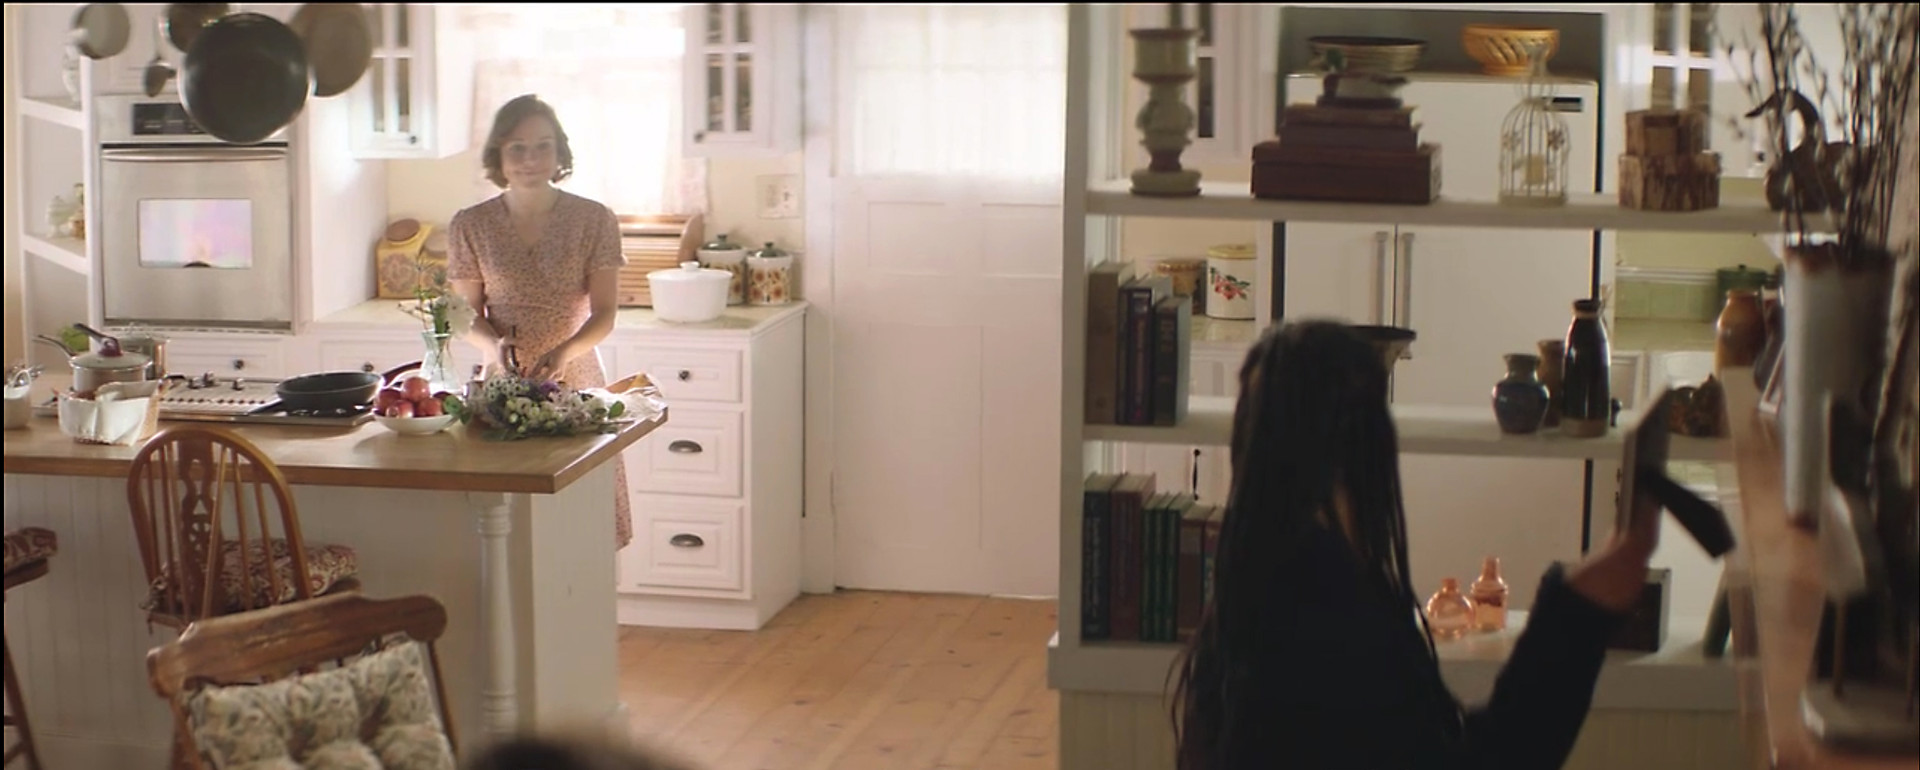 Living rom into kitchen.jpg